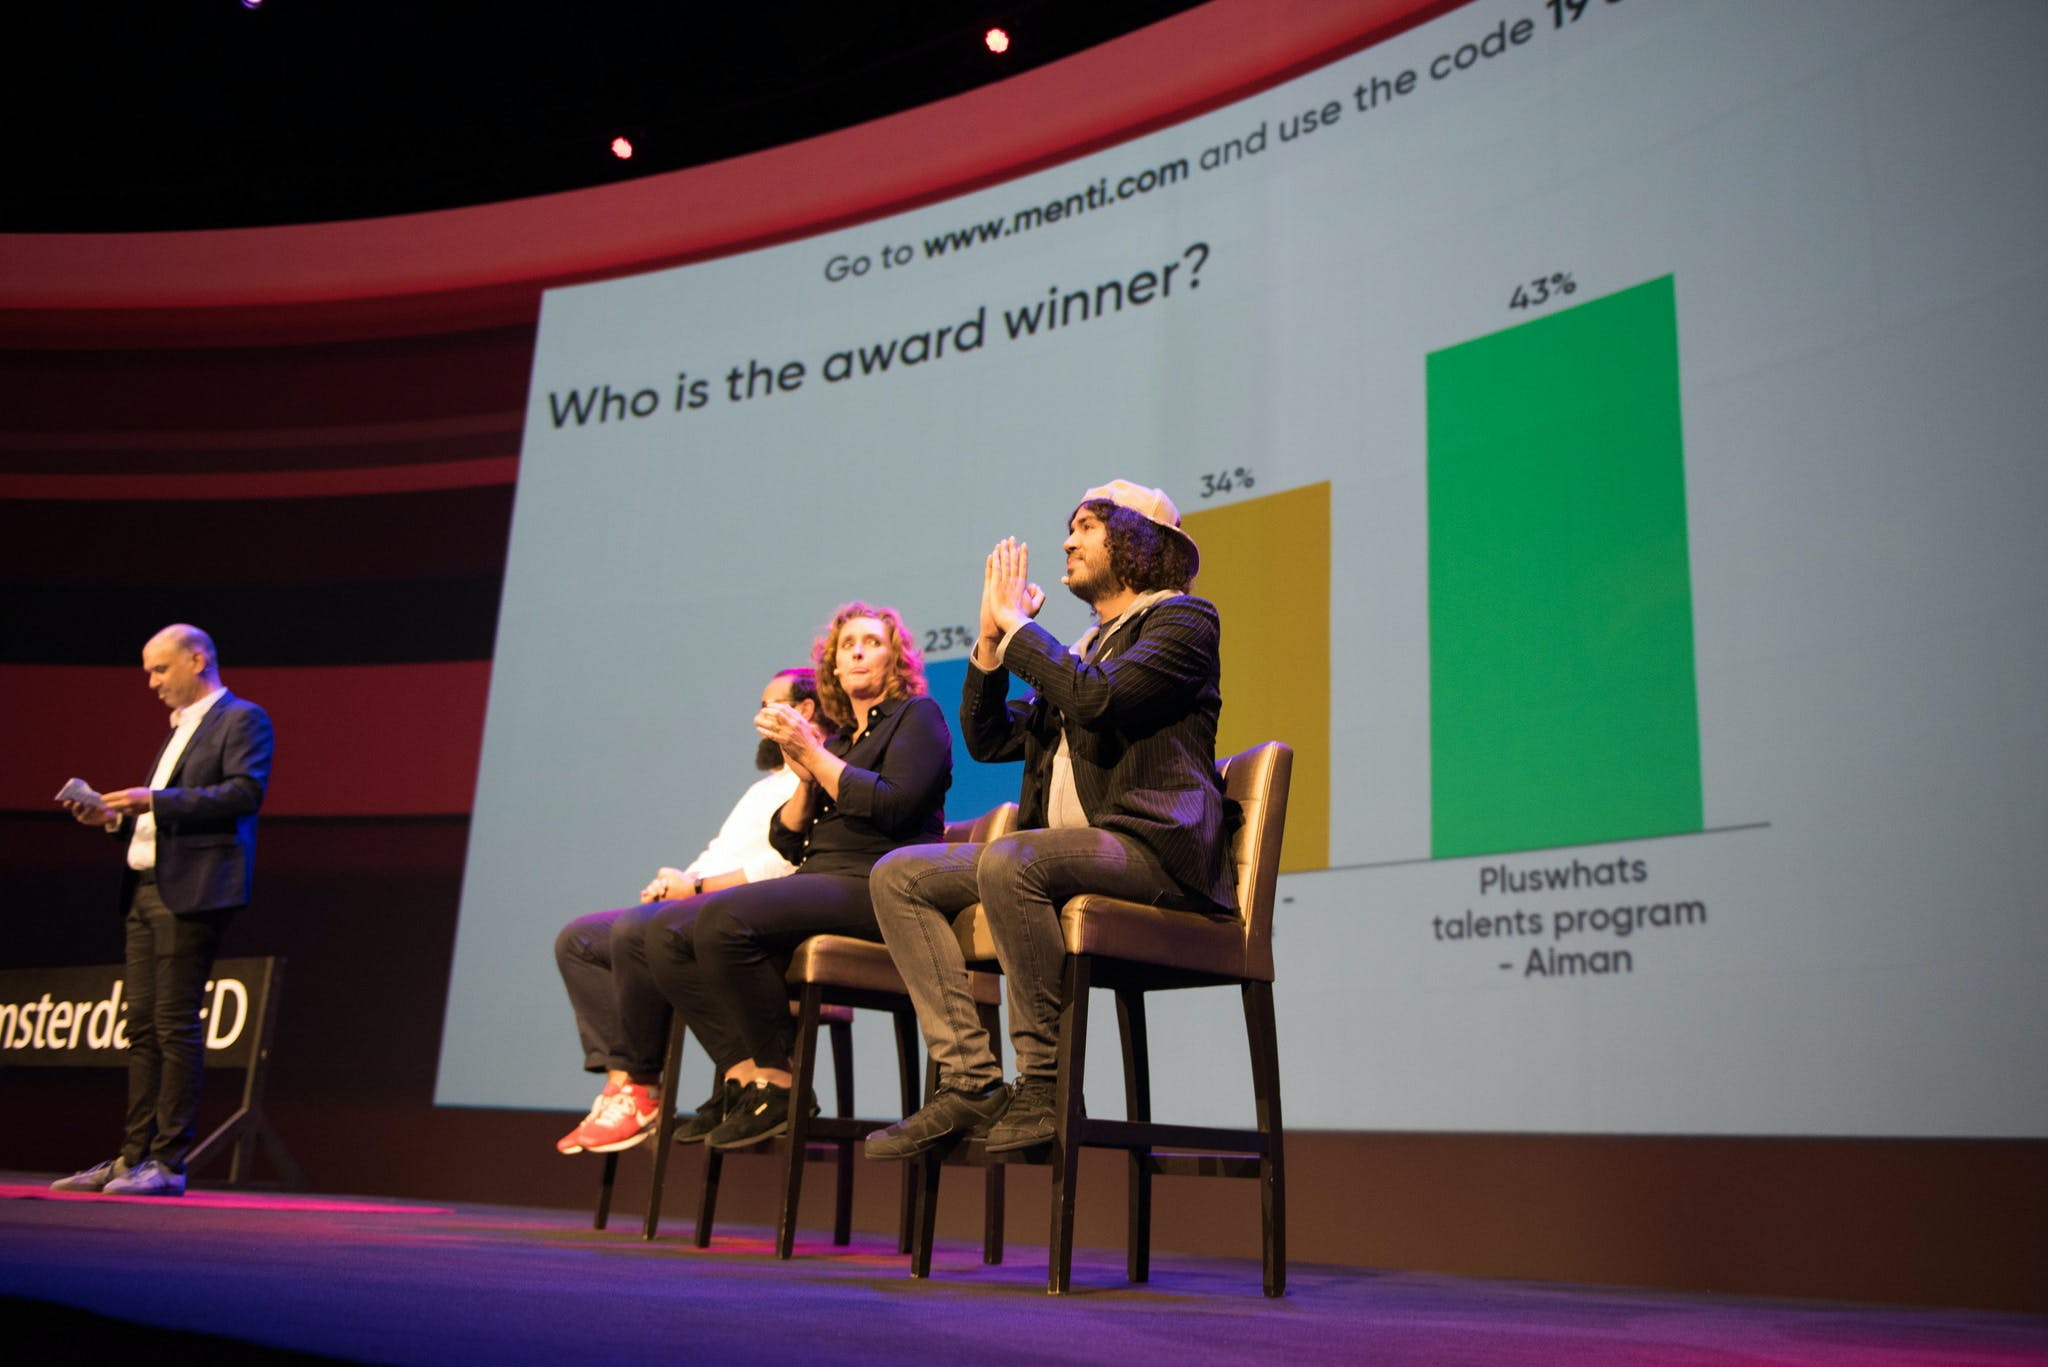 TEDxAmsterdamED Award Organizer